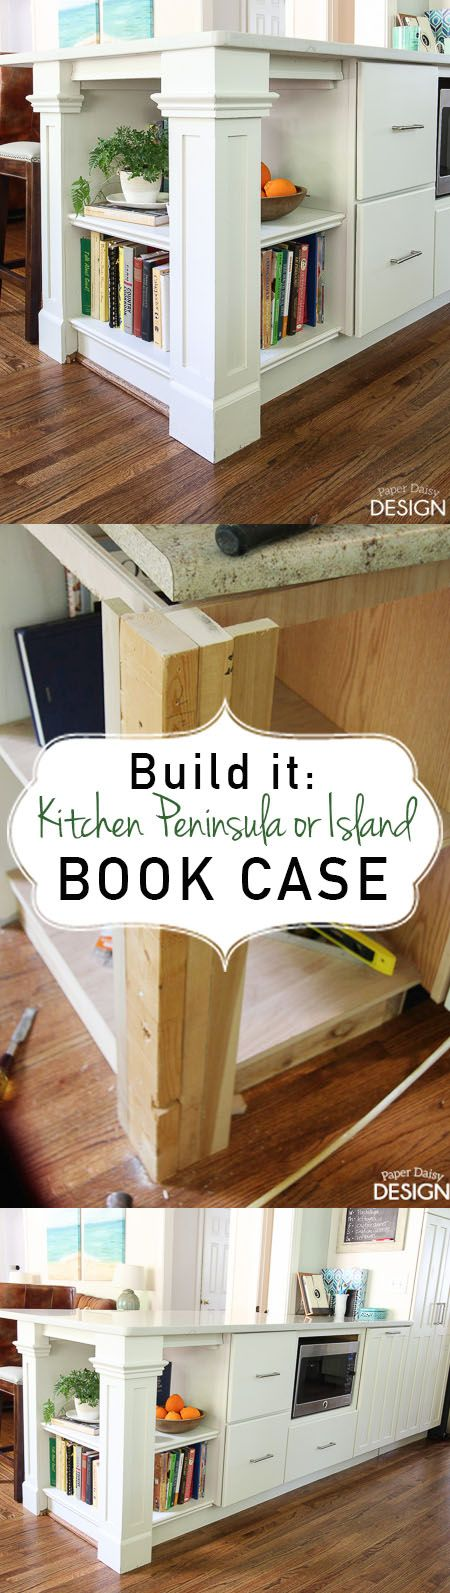 Build It Custom Kitchen Bookcase Building A Kitchen